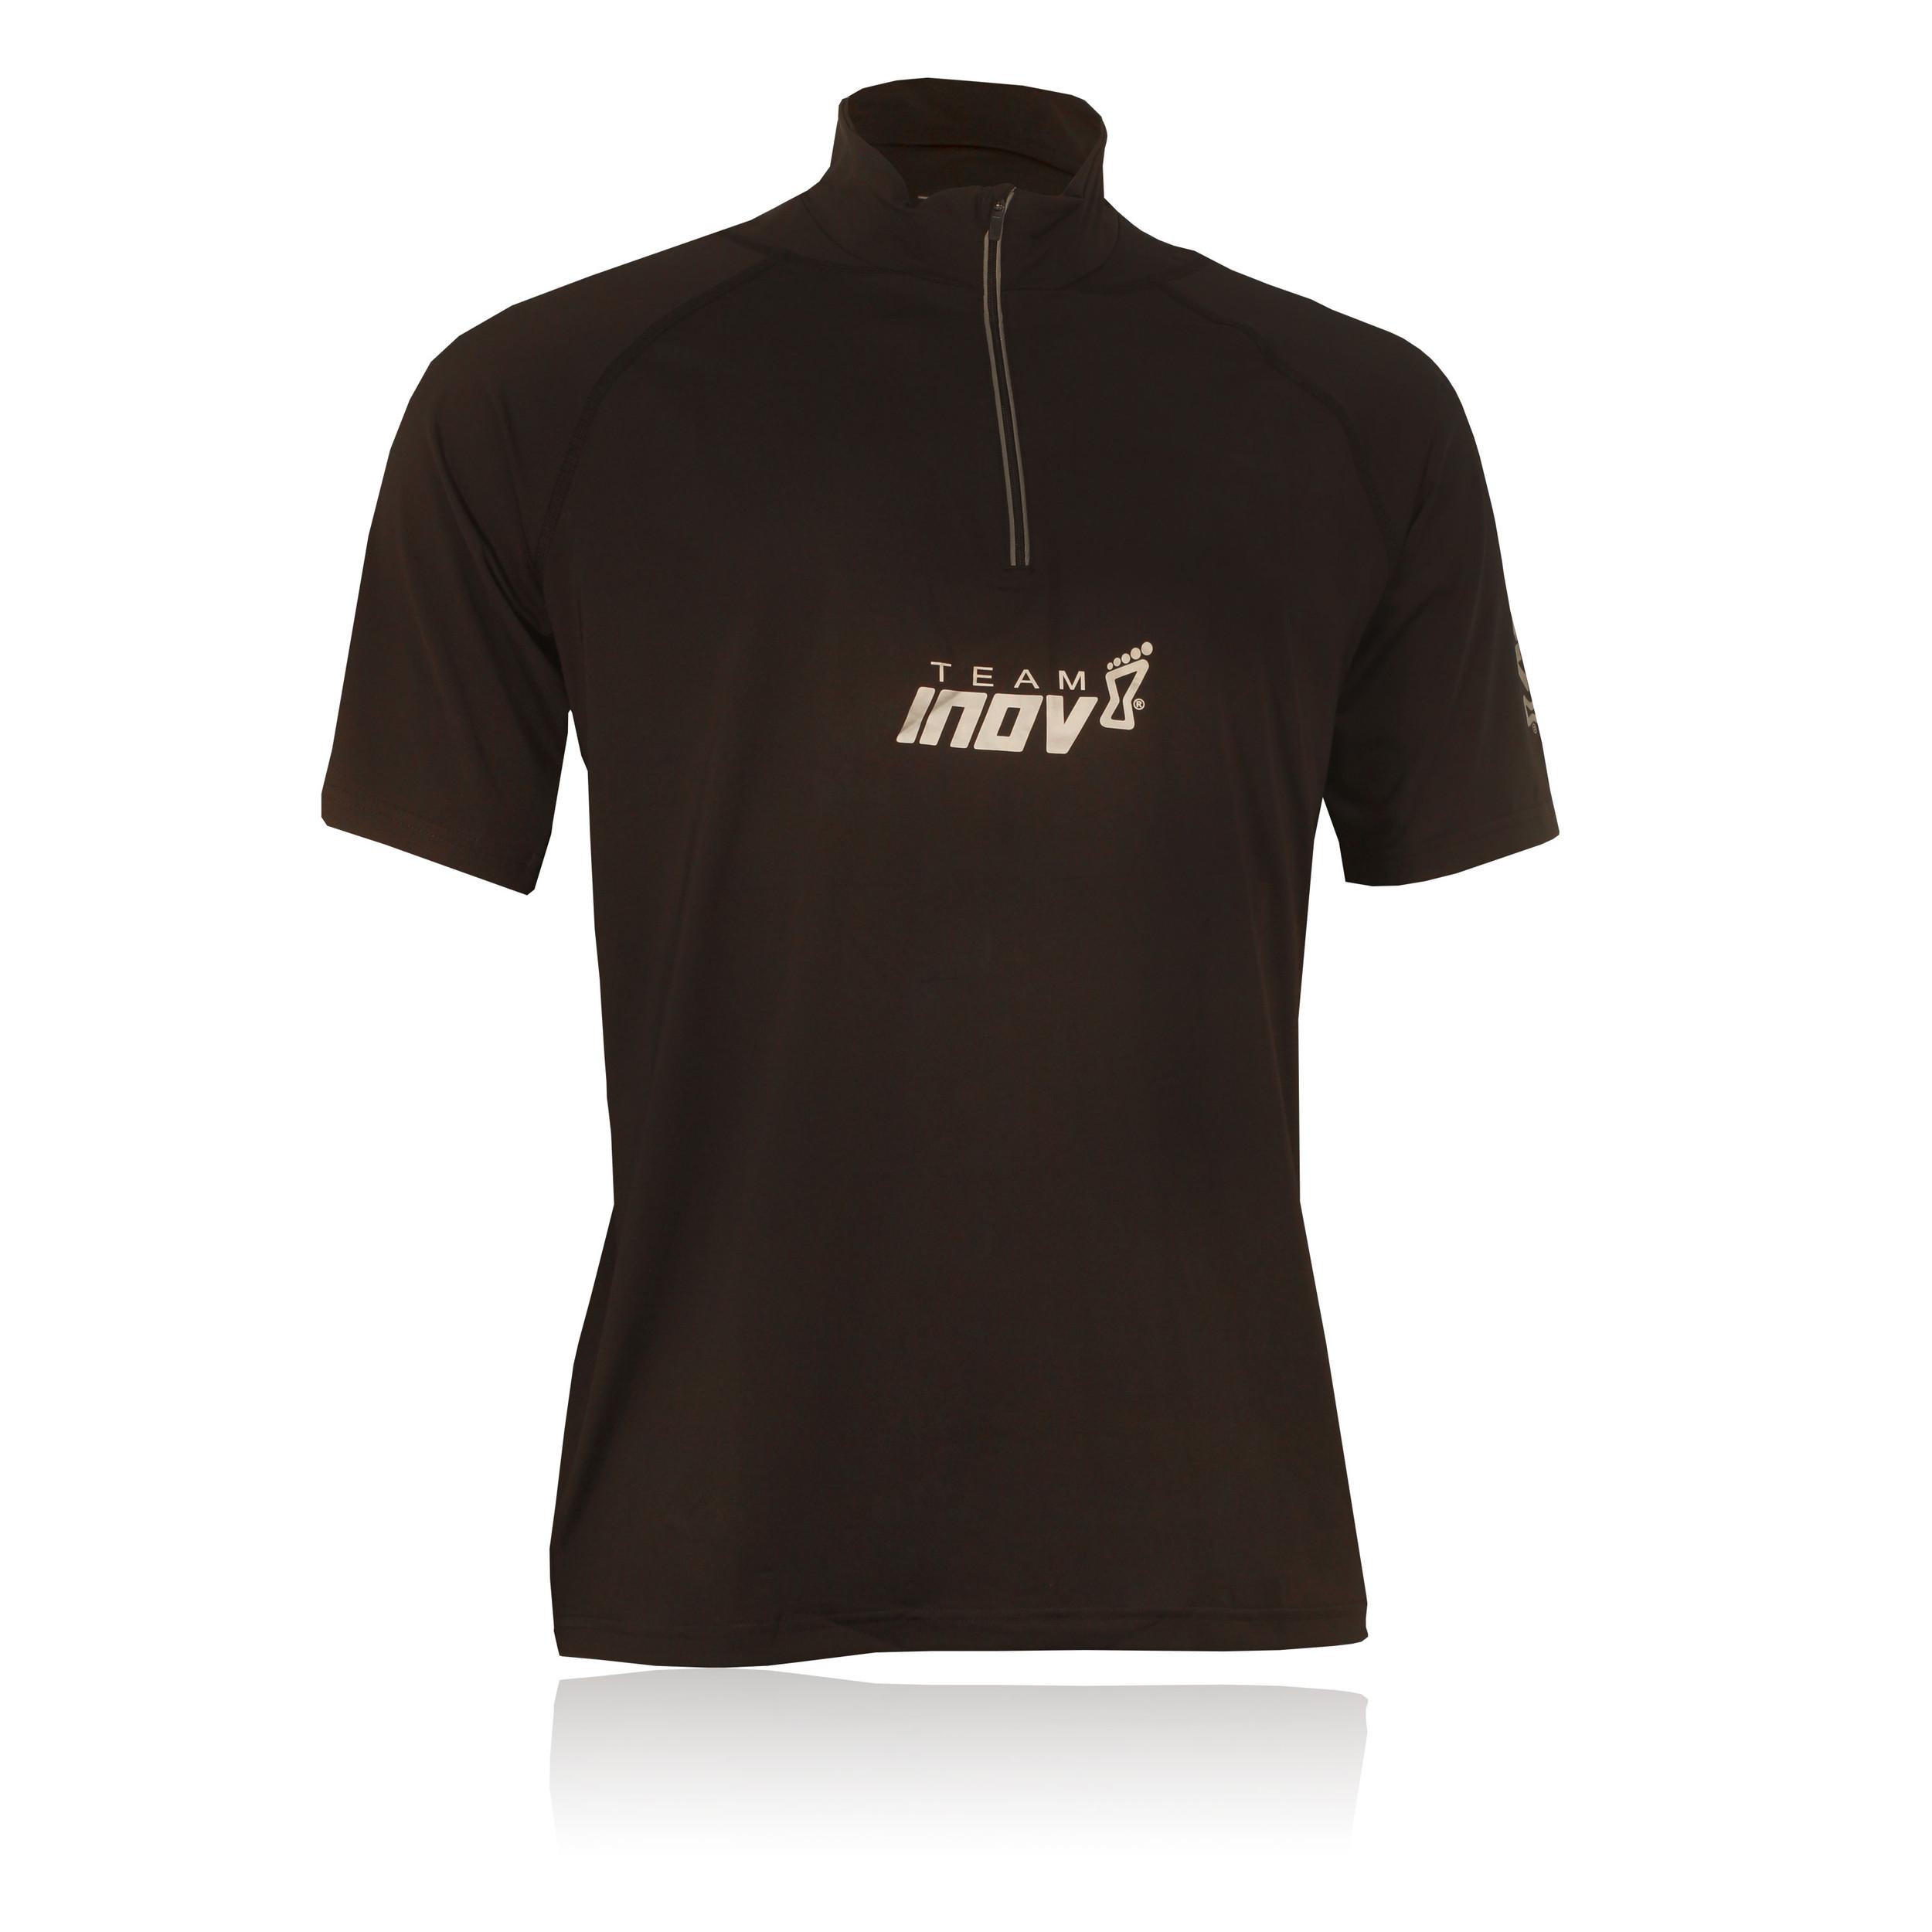 Inov8 Team Zip Tech Running T Shirt